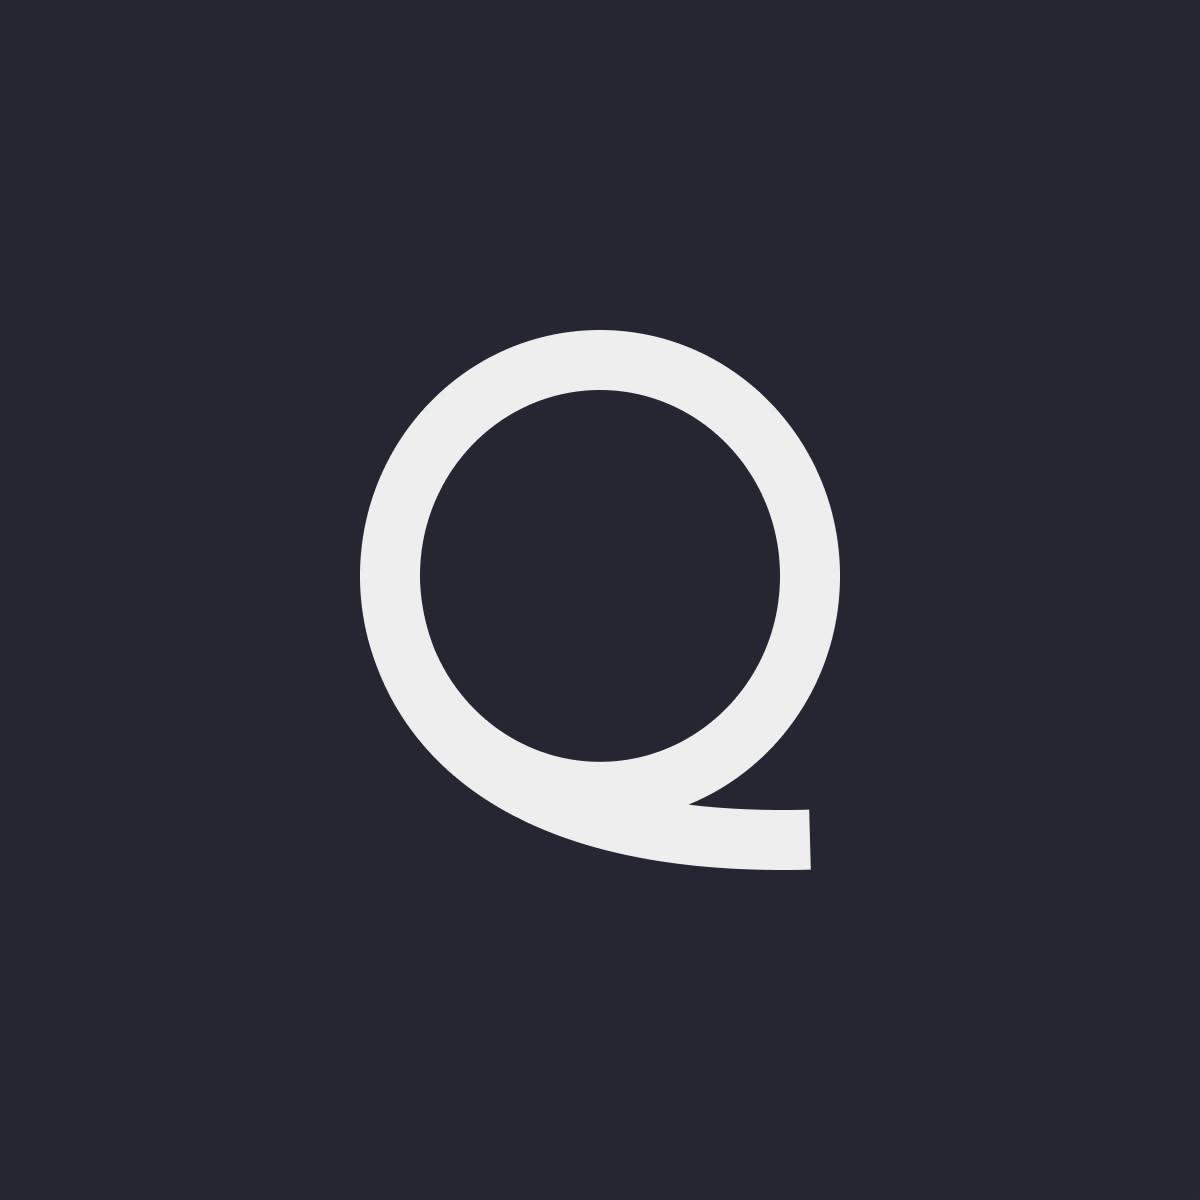 Qatalog's logo